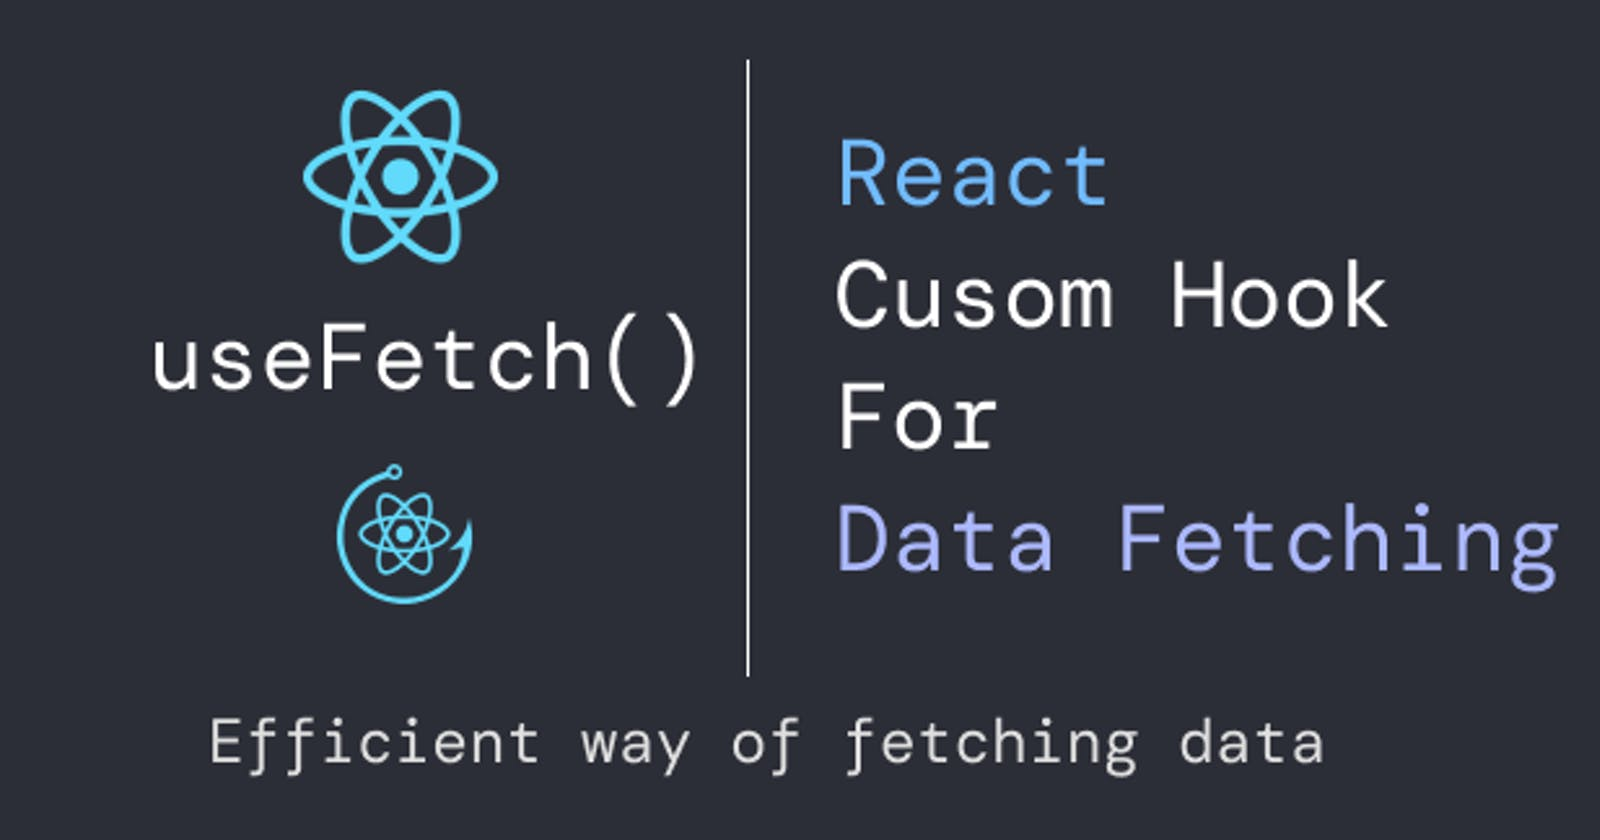 useFetch(): My most used react custom hook